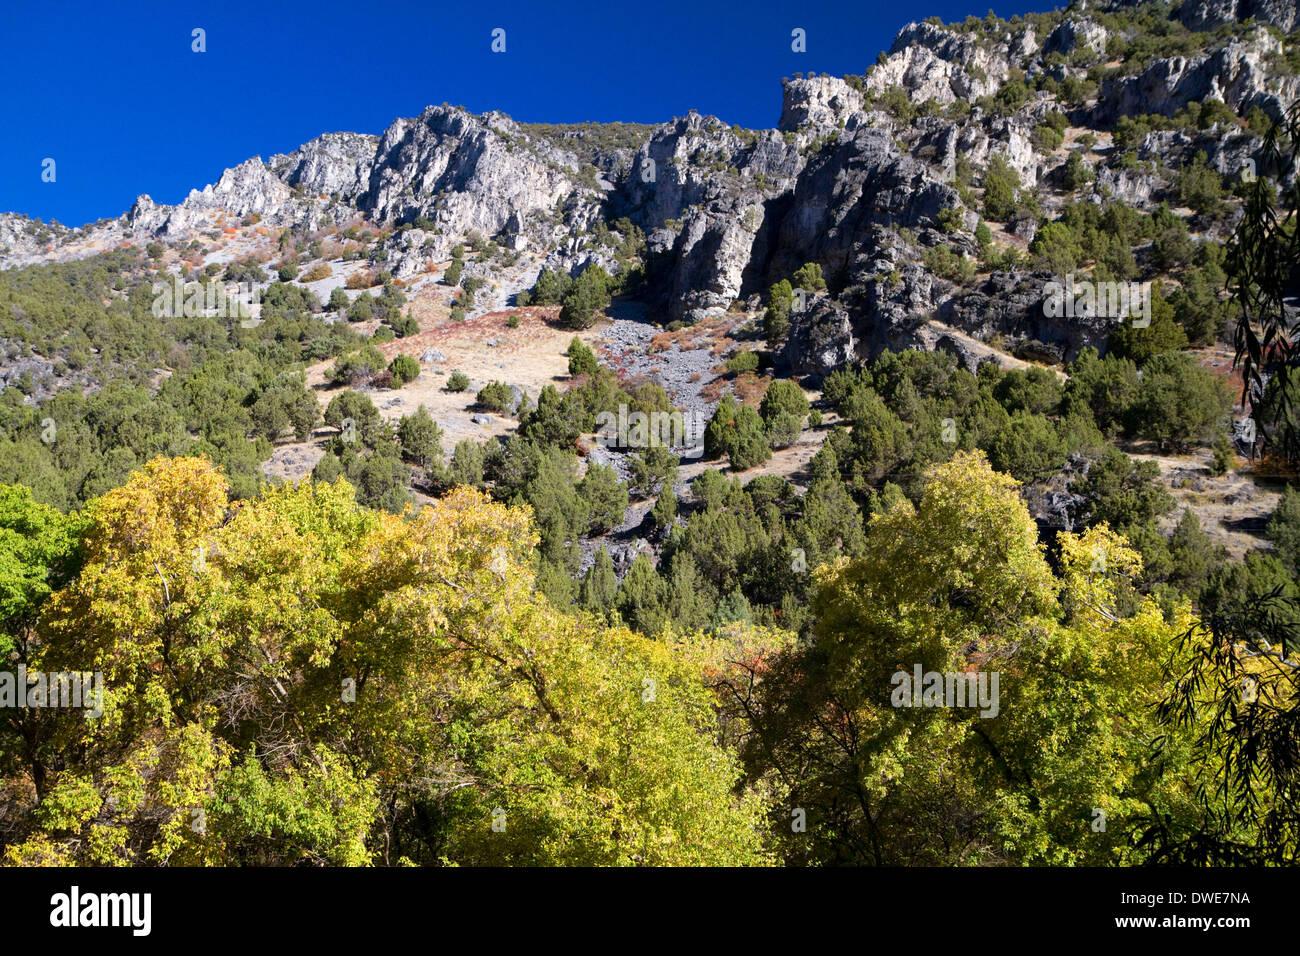 The Bear River Mountains in Logan Canyon, Utah, USA. - Stock Image